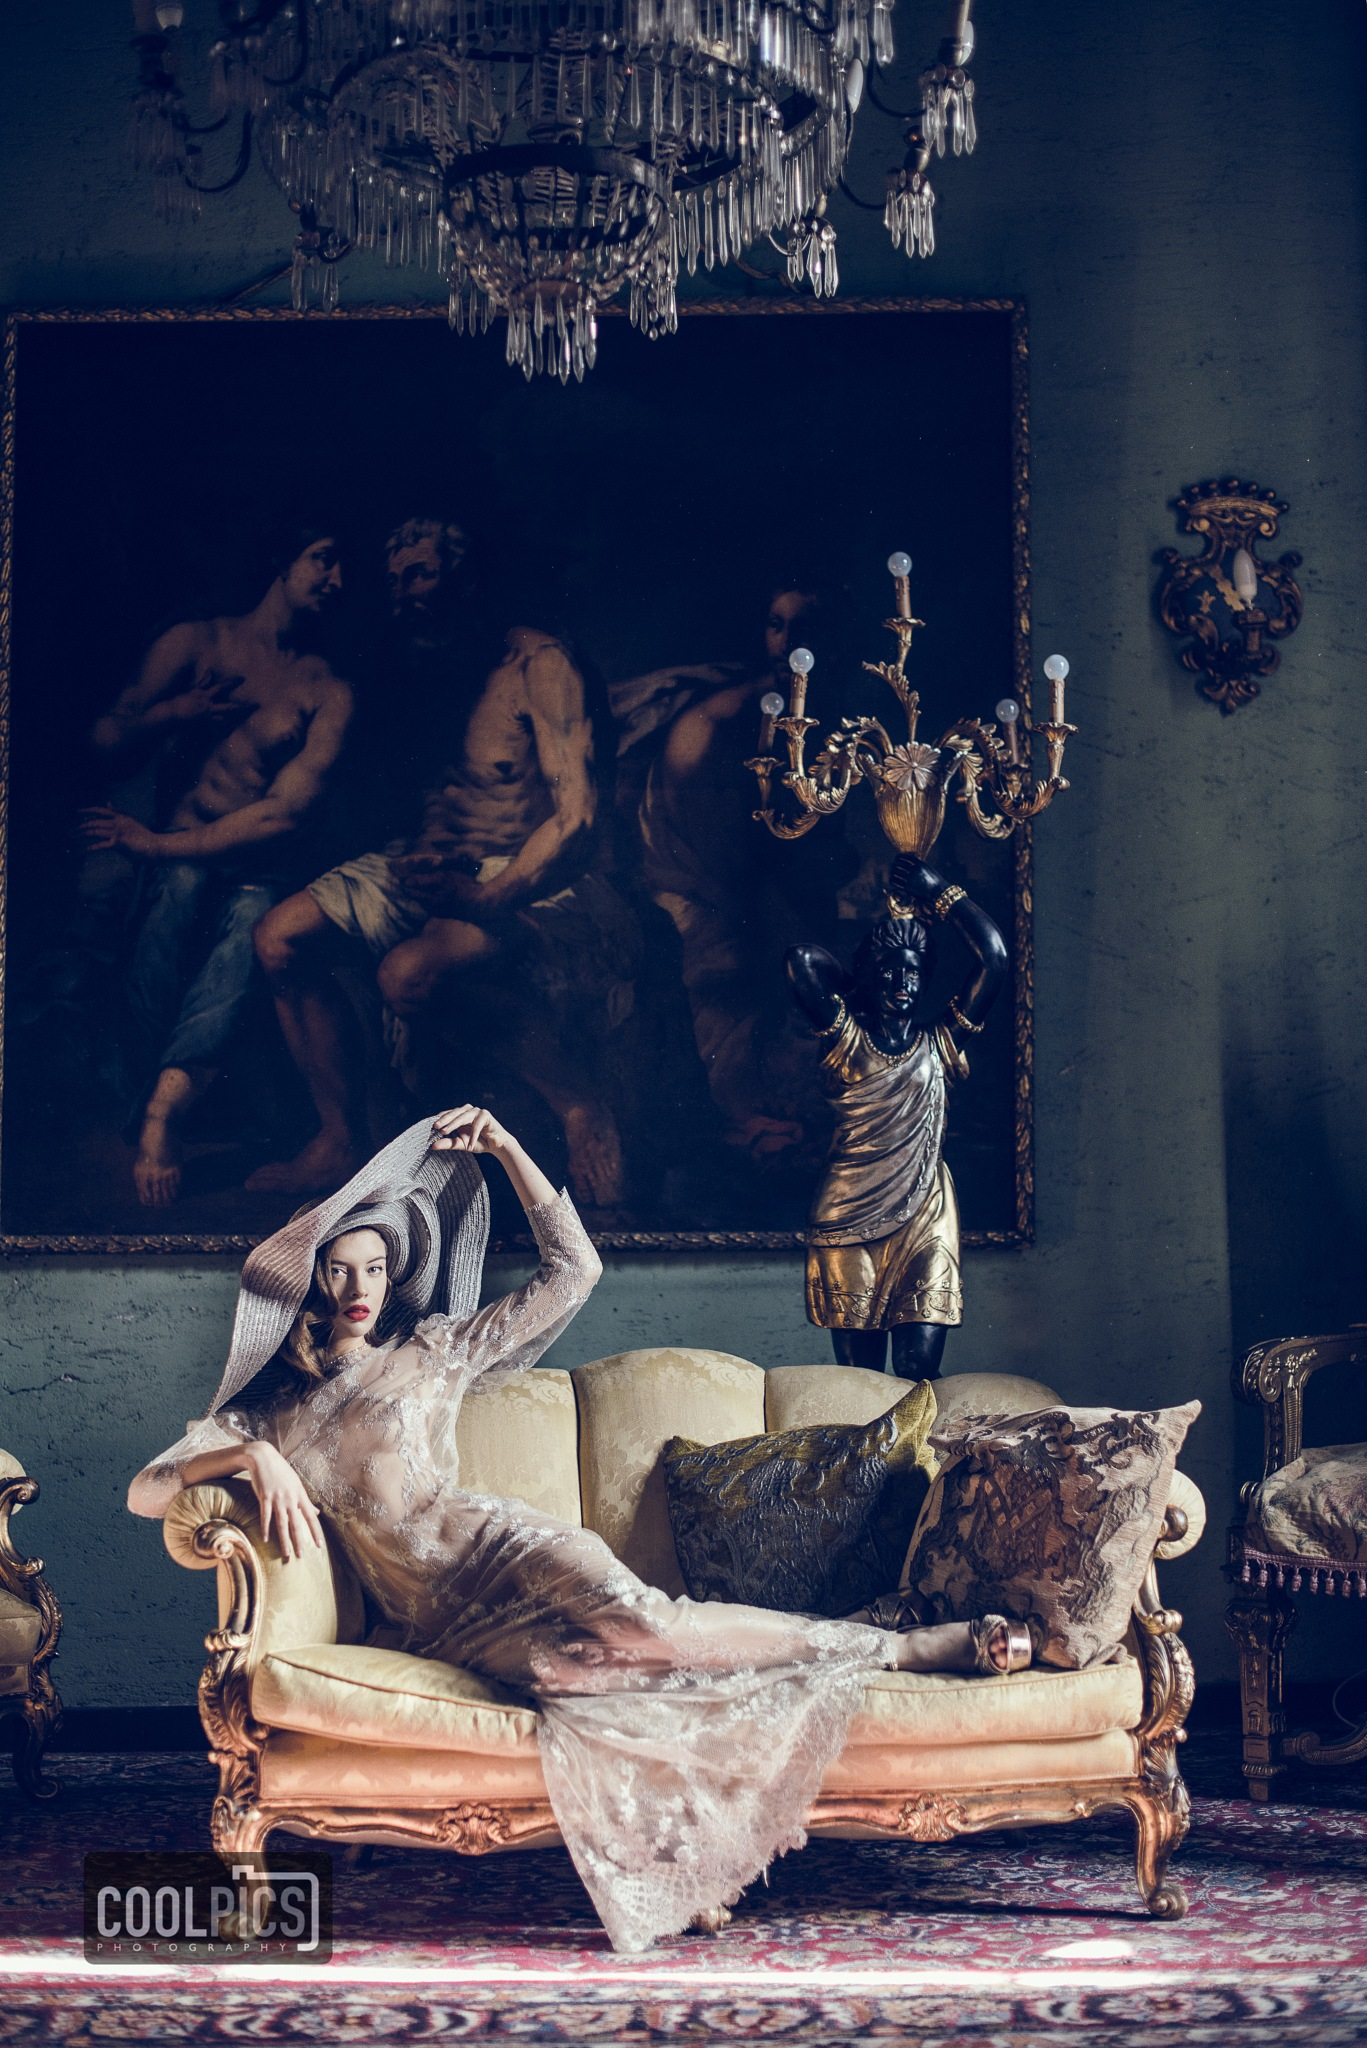 GLORIA by Daniel Demunter Photography